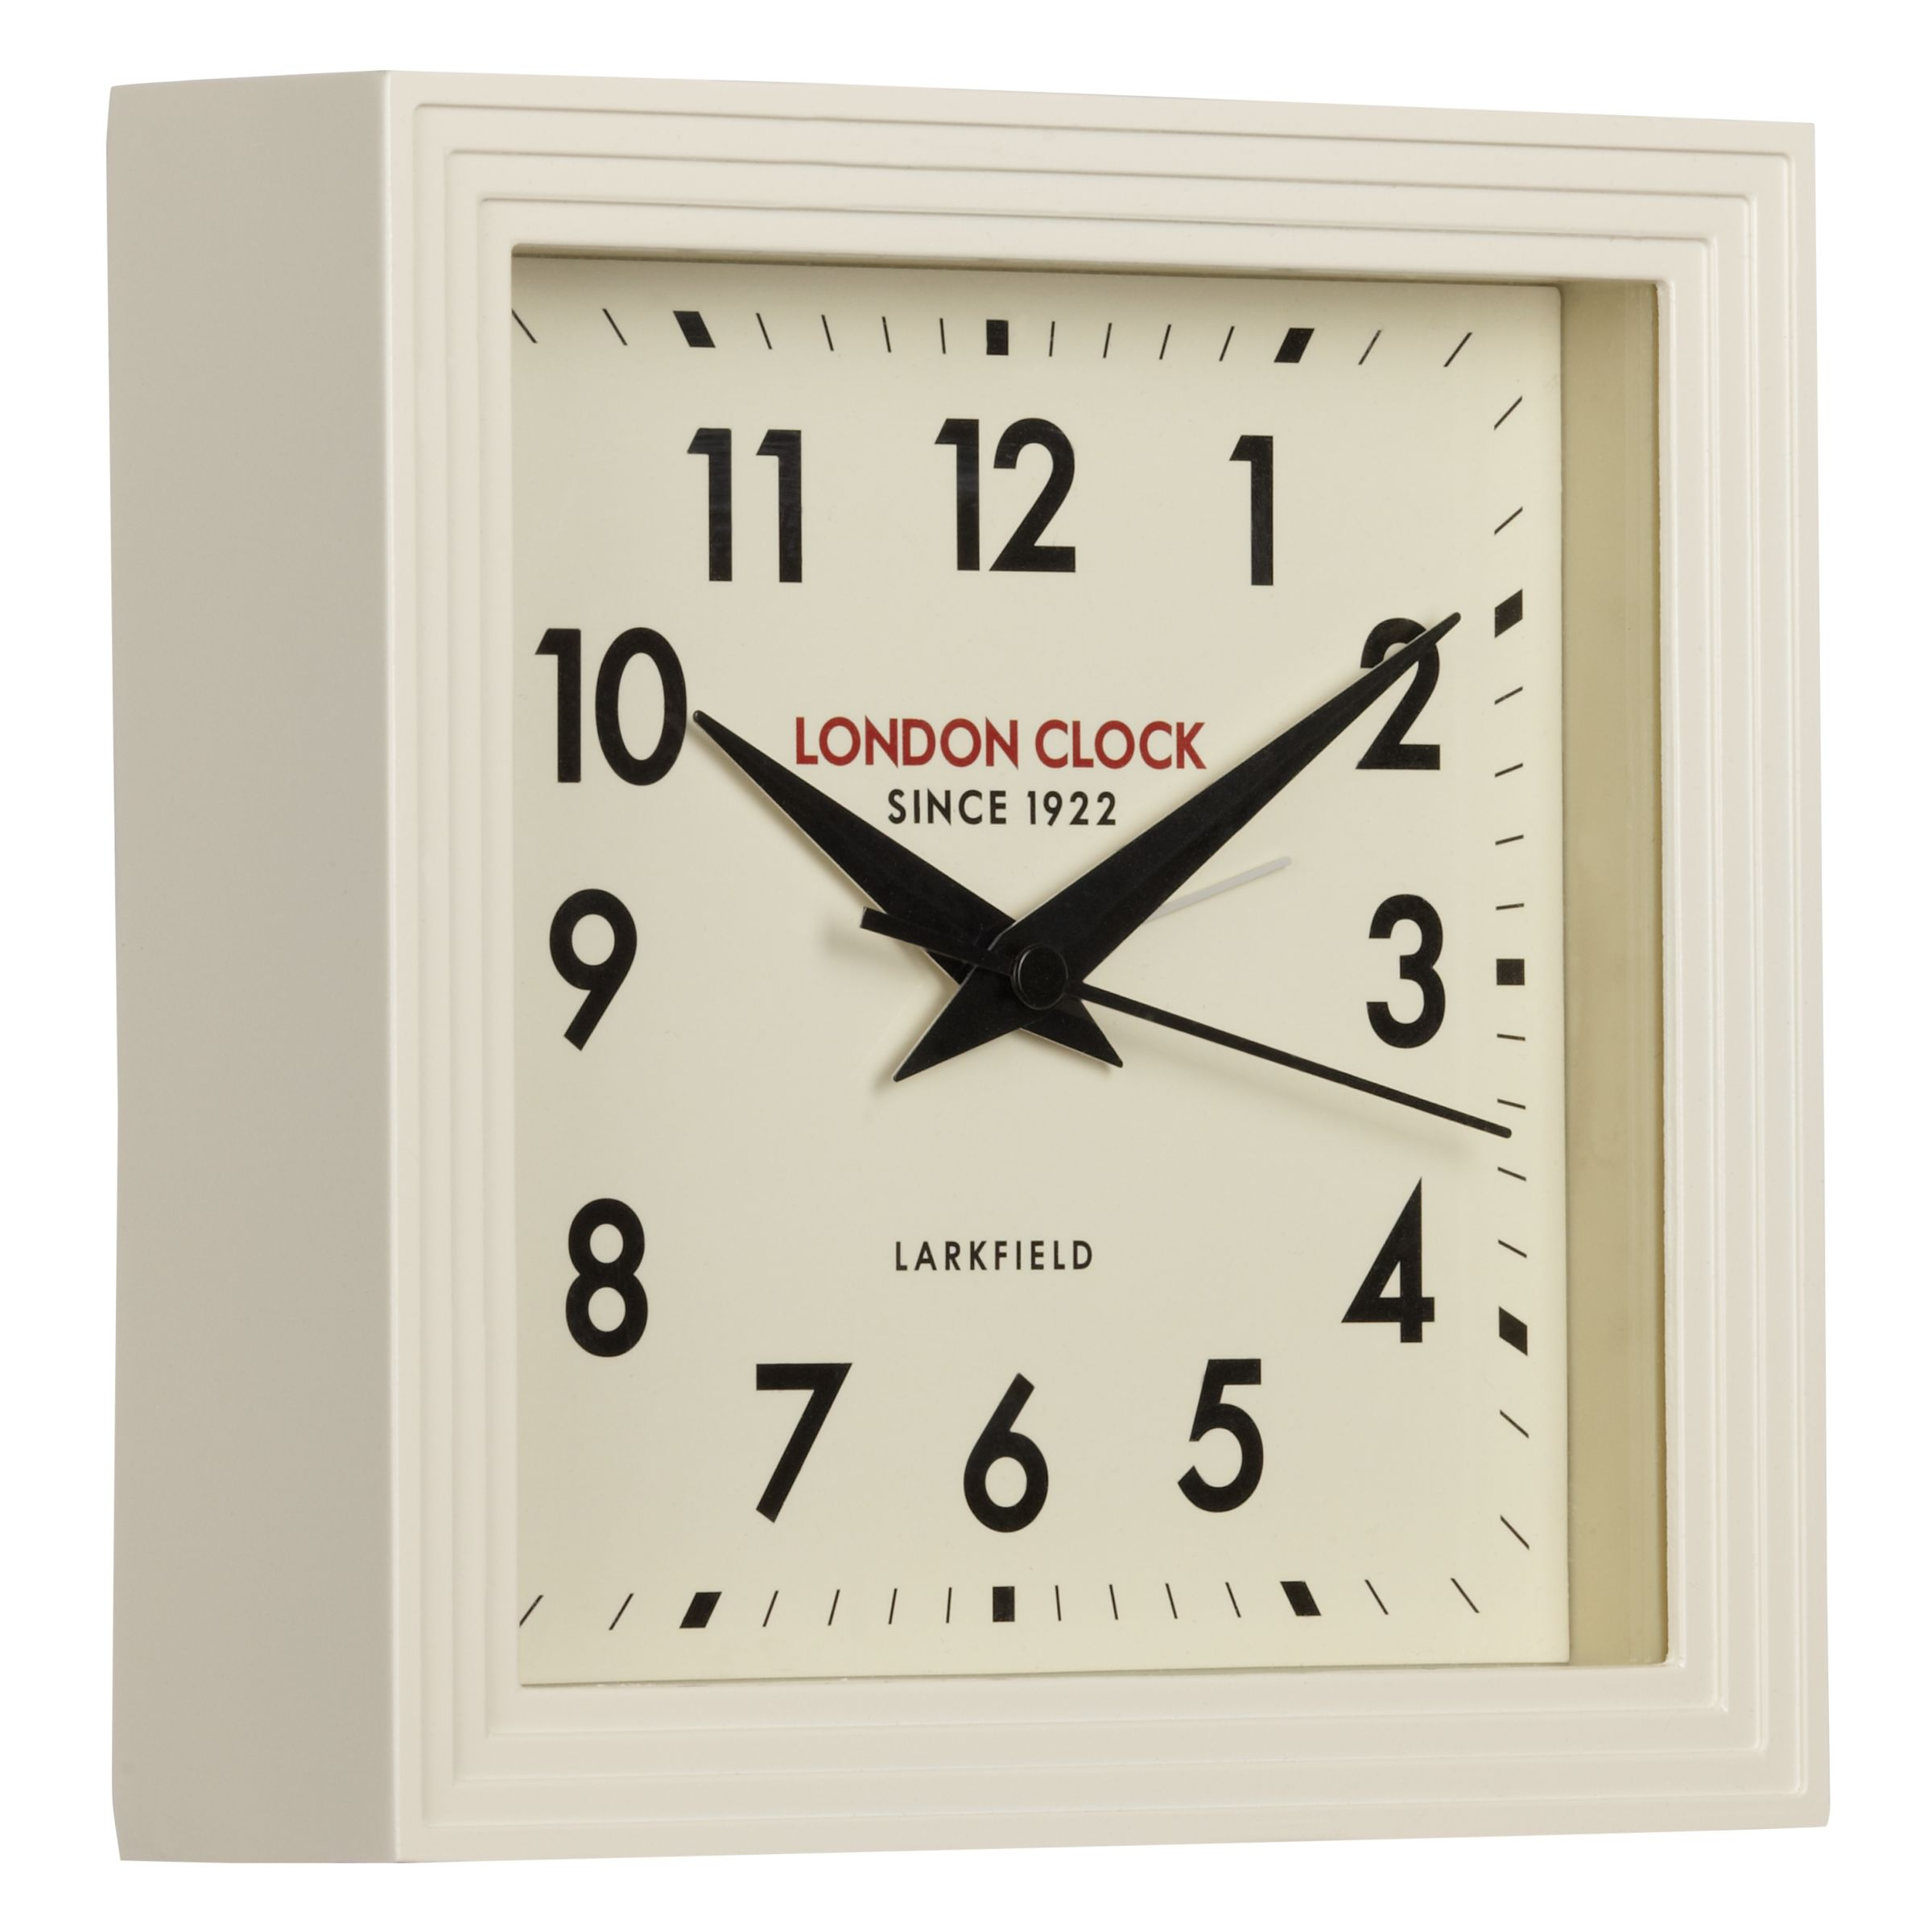 London Clock Company London Clock Company 1922 Square Station Mantel Clock